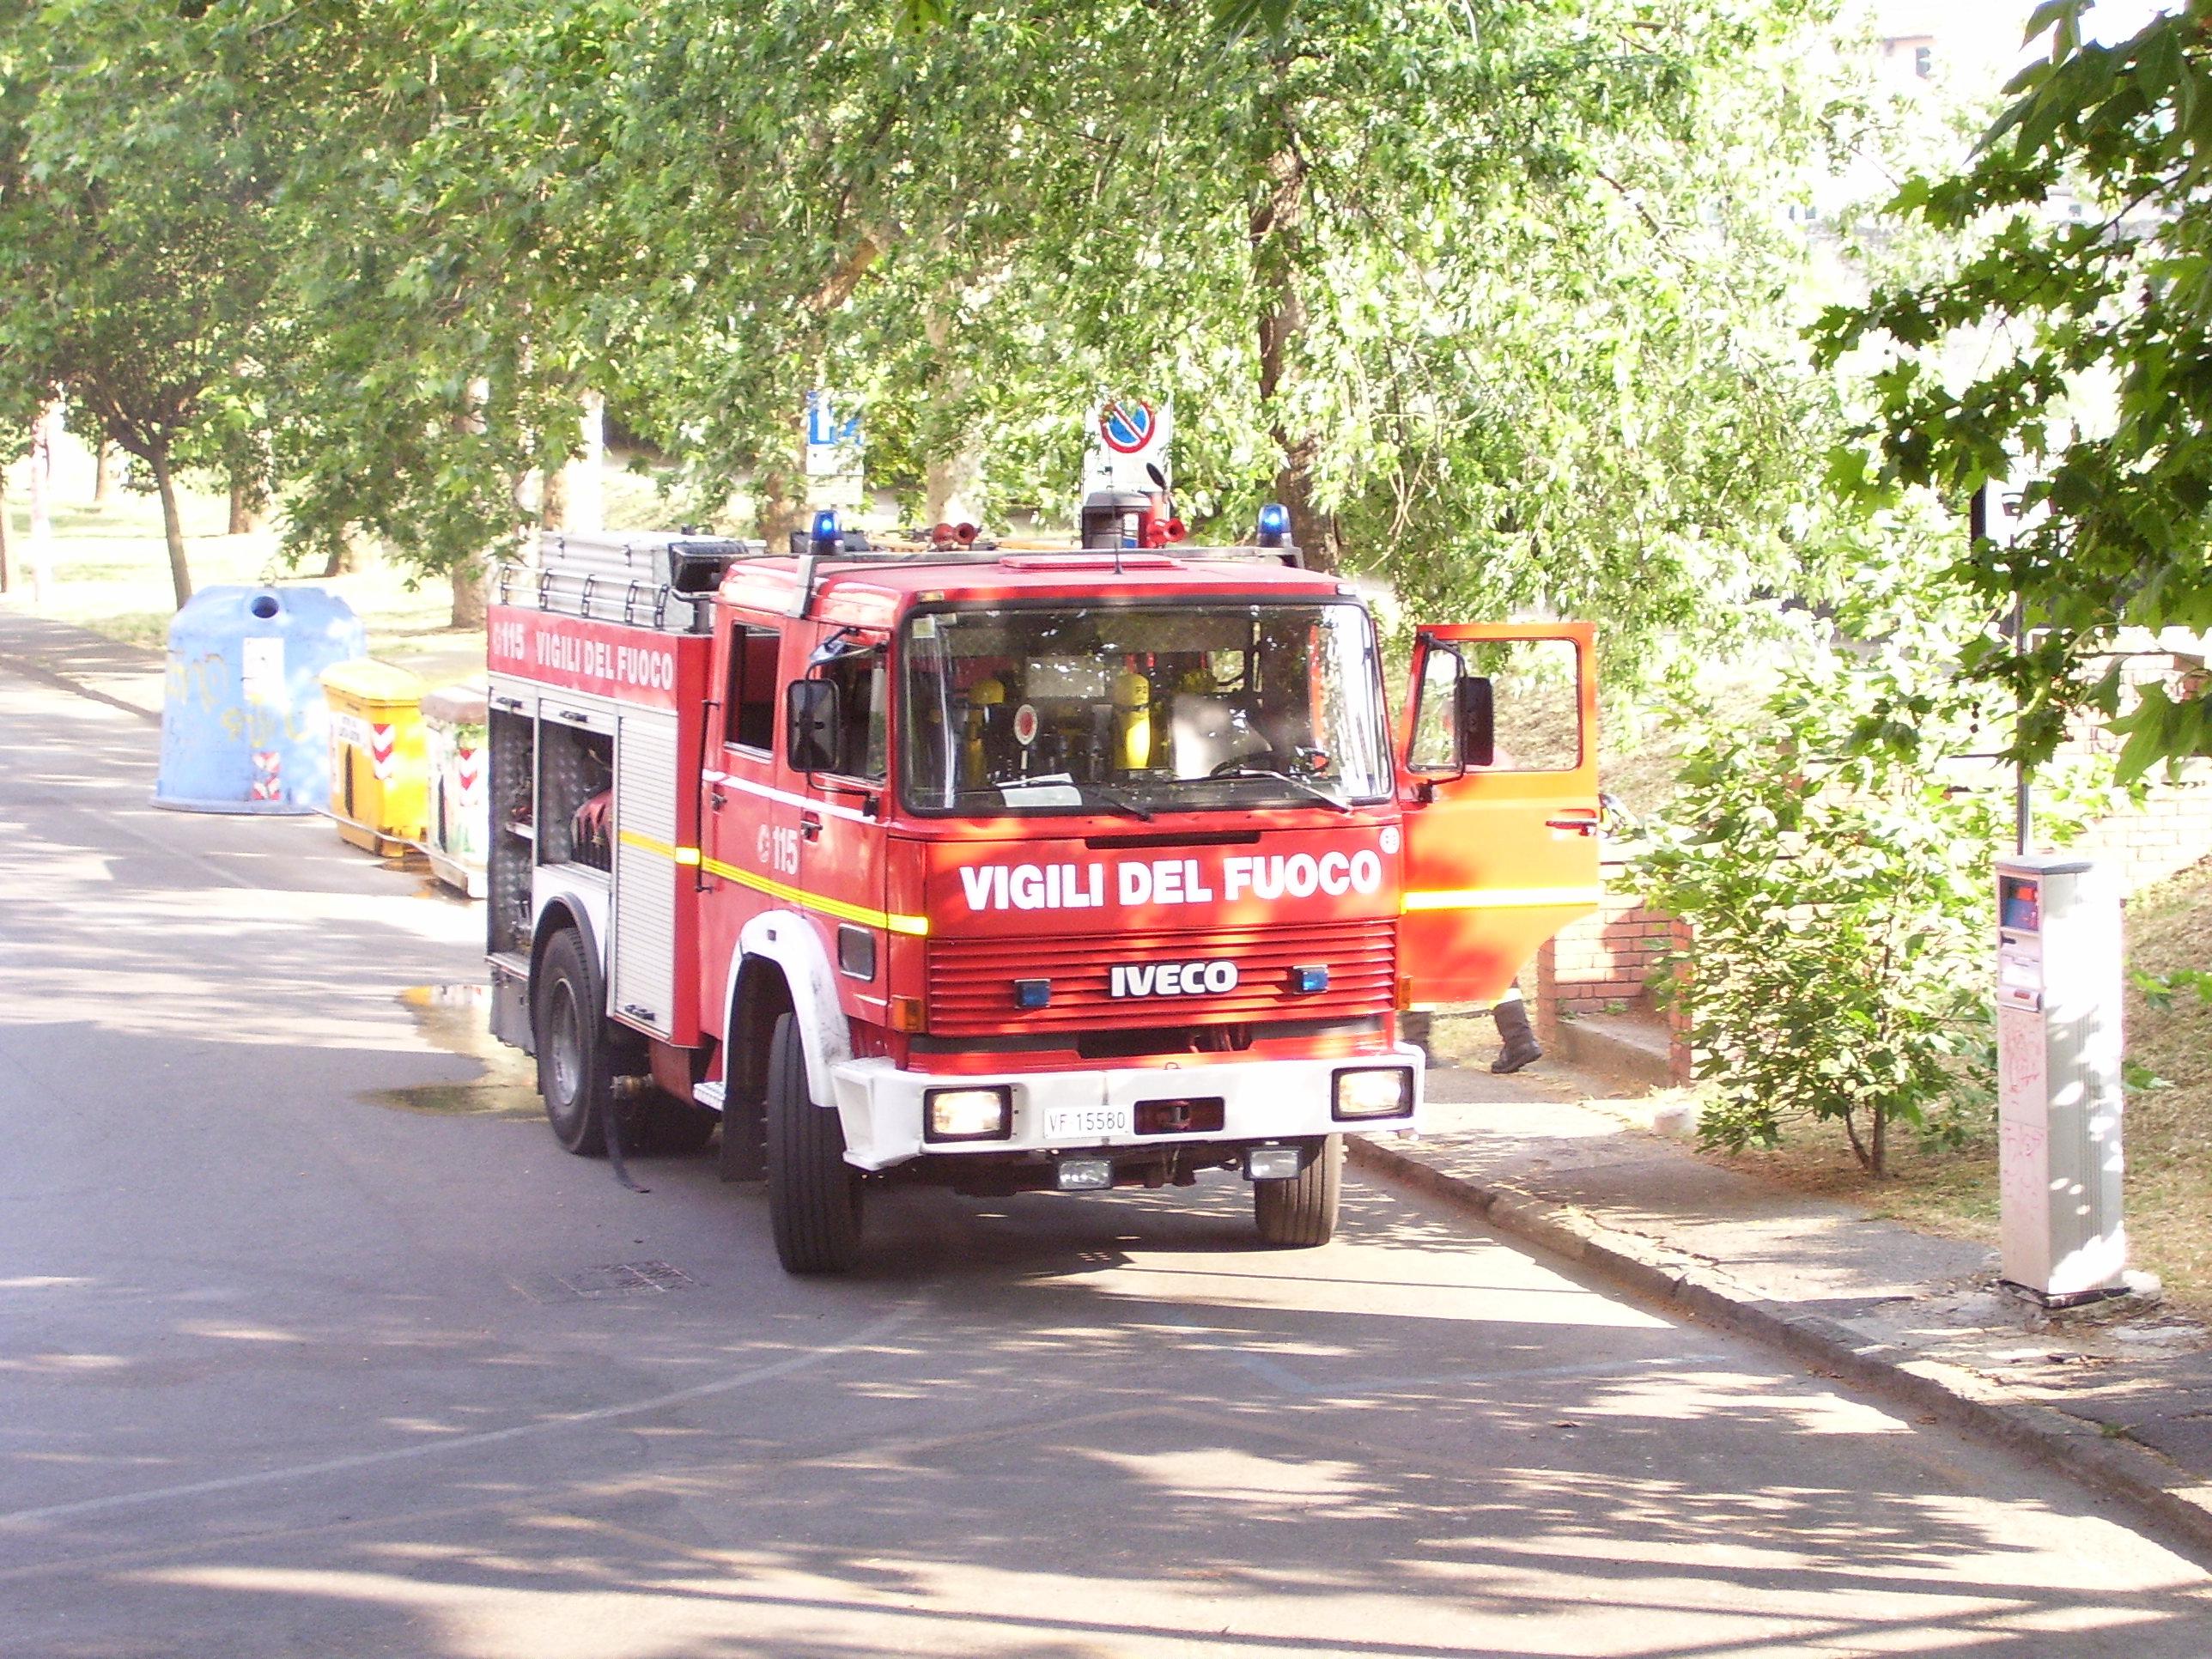 Esplode distributore, incendio in via Salaria: due vittime